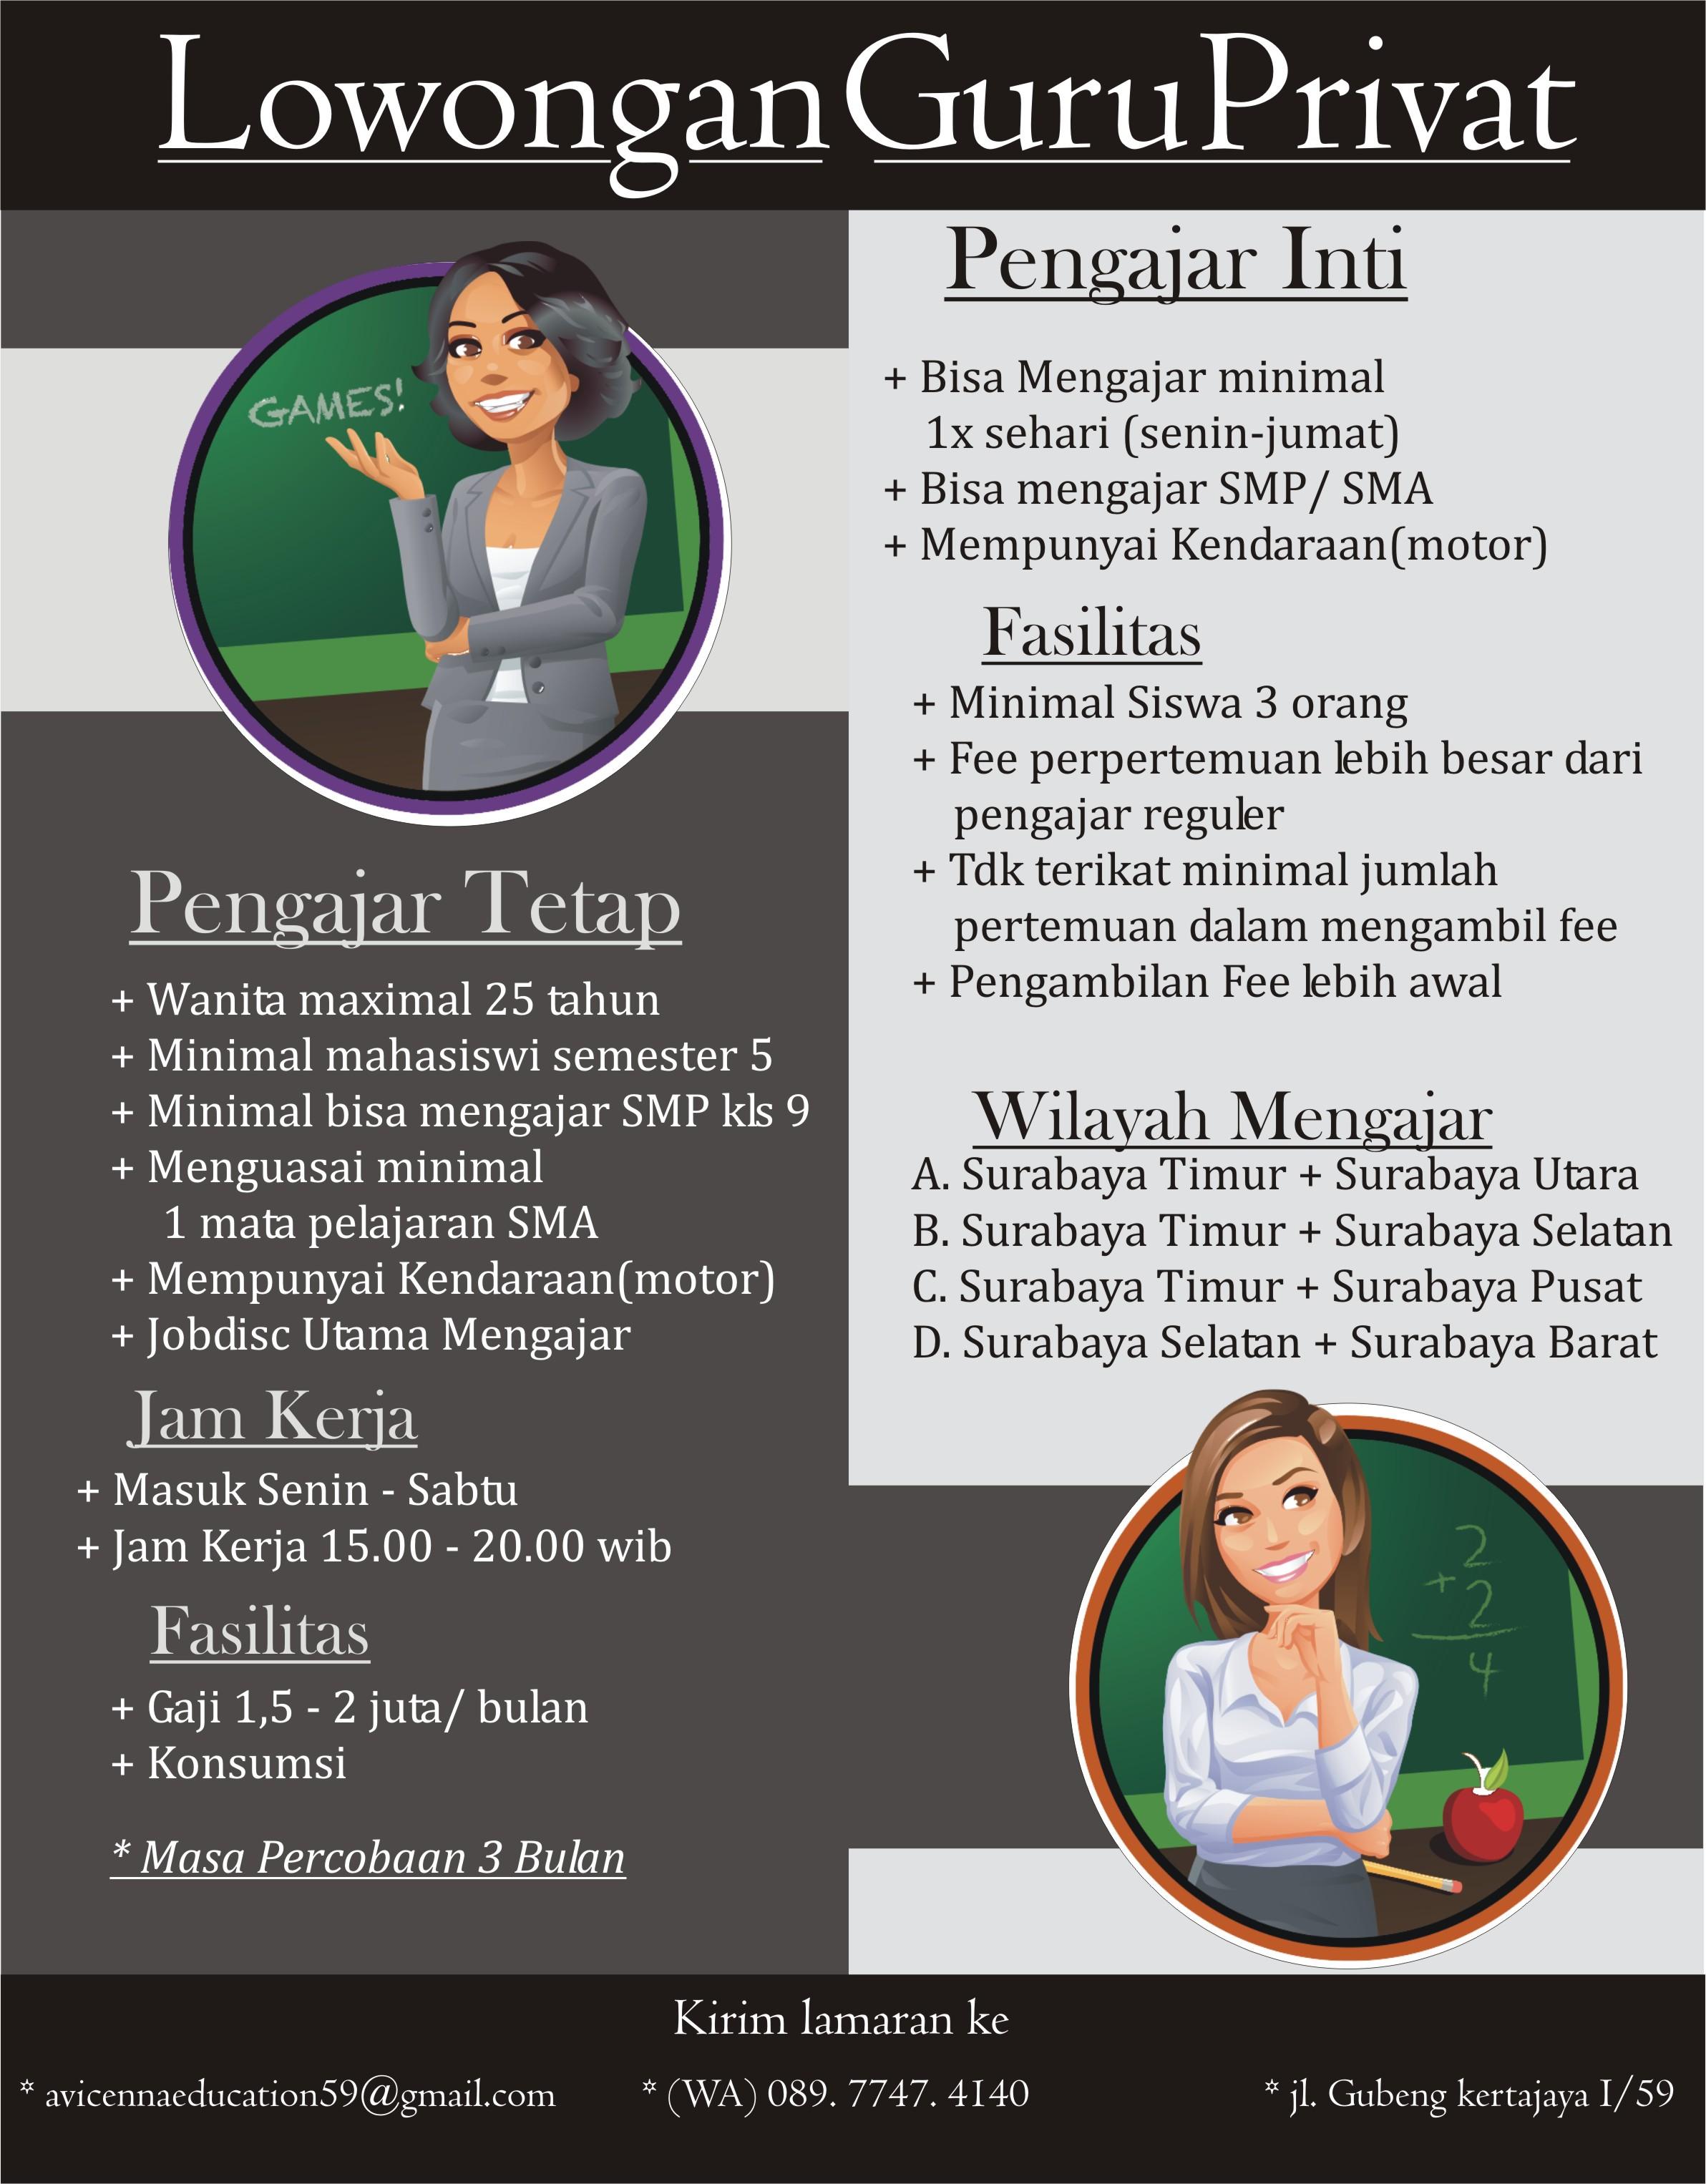 Lowongan Guru Privat Surabaya Les Privat Surabaya